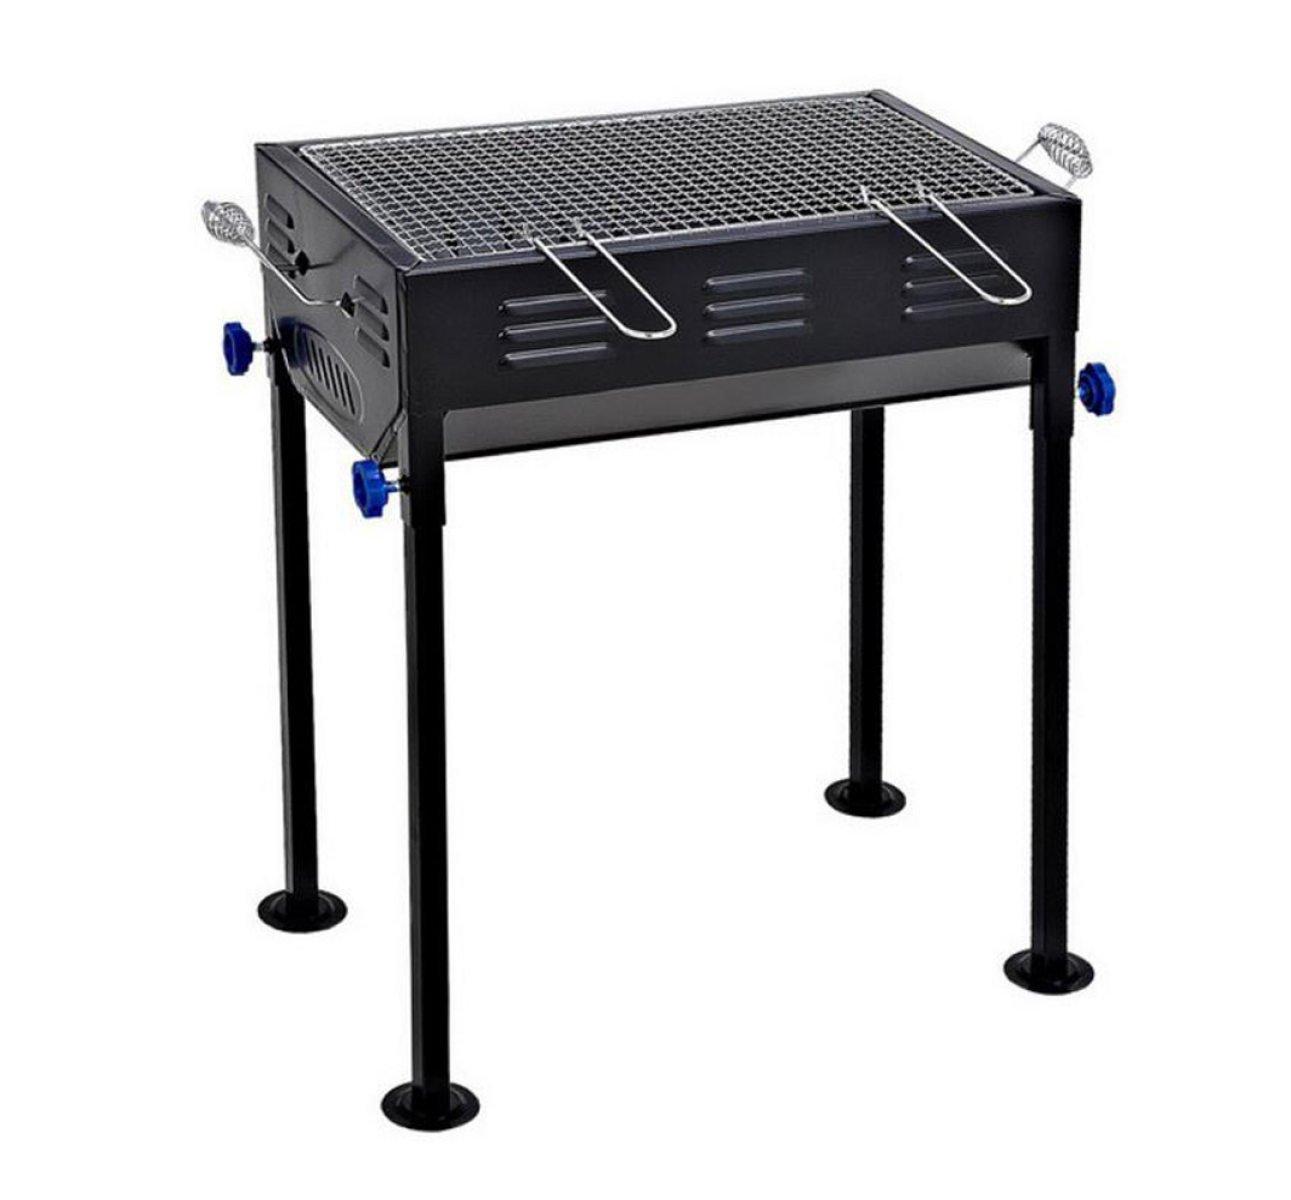 Kebab Grill Camping   Klappbaren Im Tragbare Kohlegrill Im Klappbaren Freien Holzkohlegrill Grill-Box,C a260e4